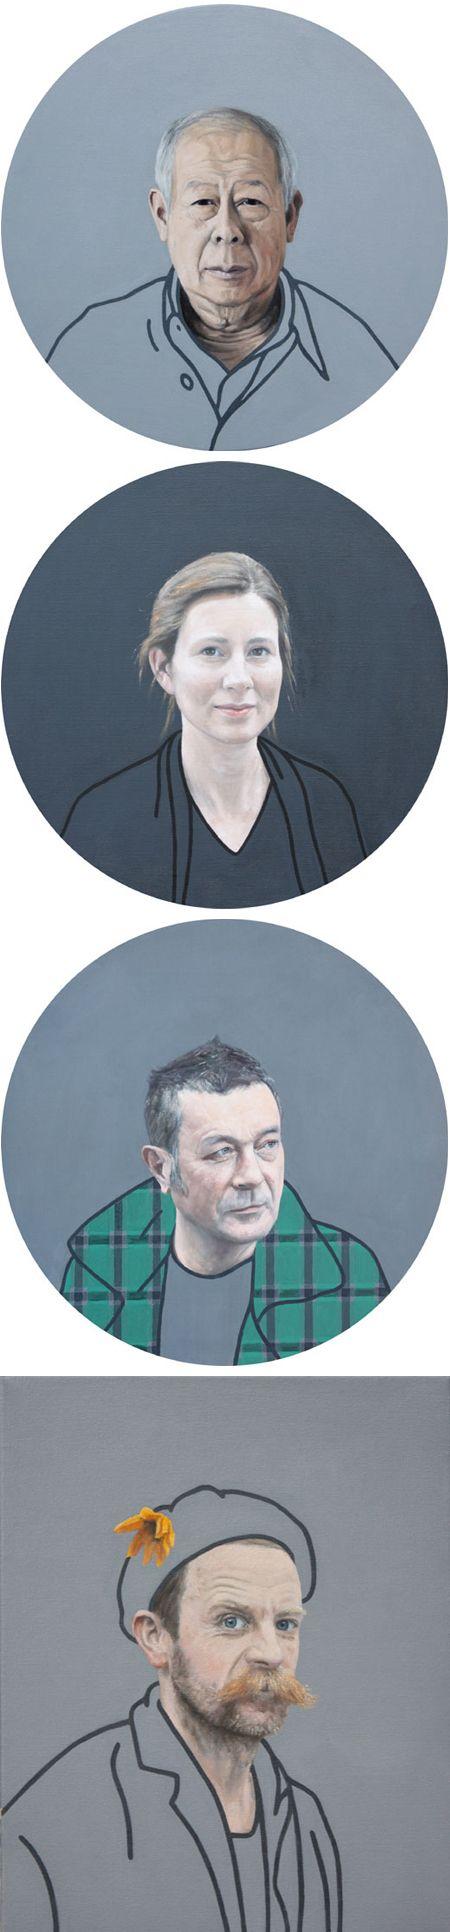 ben hughes - portraits (half detailed / half line drawing)